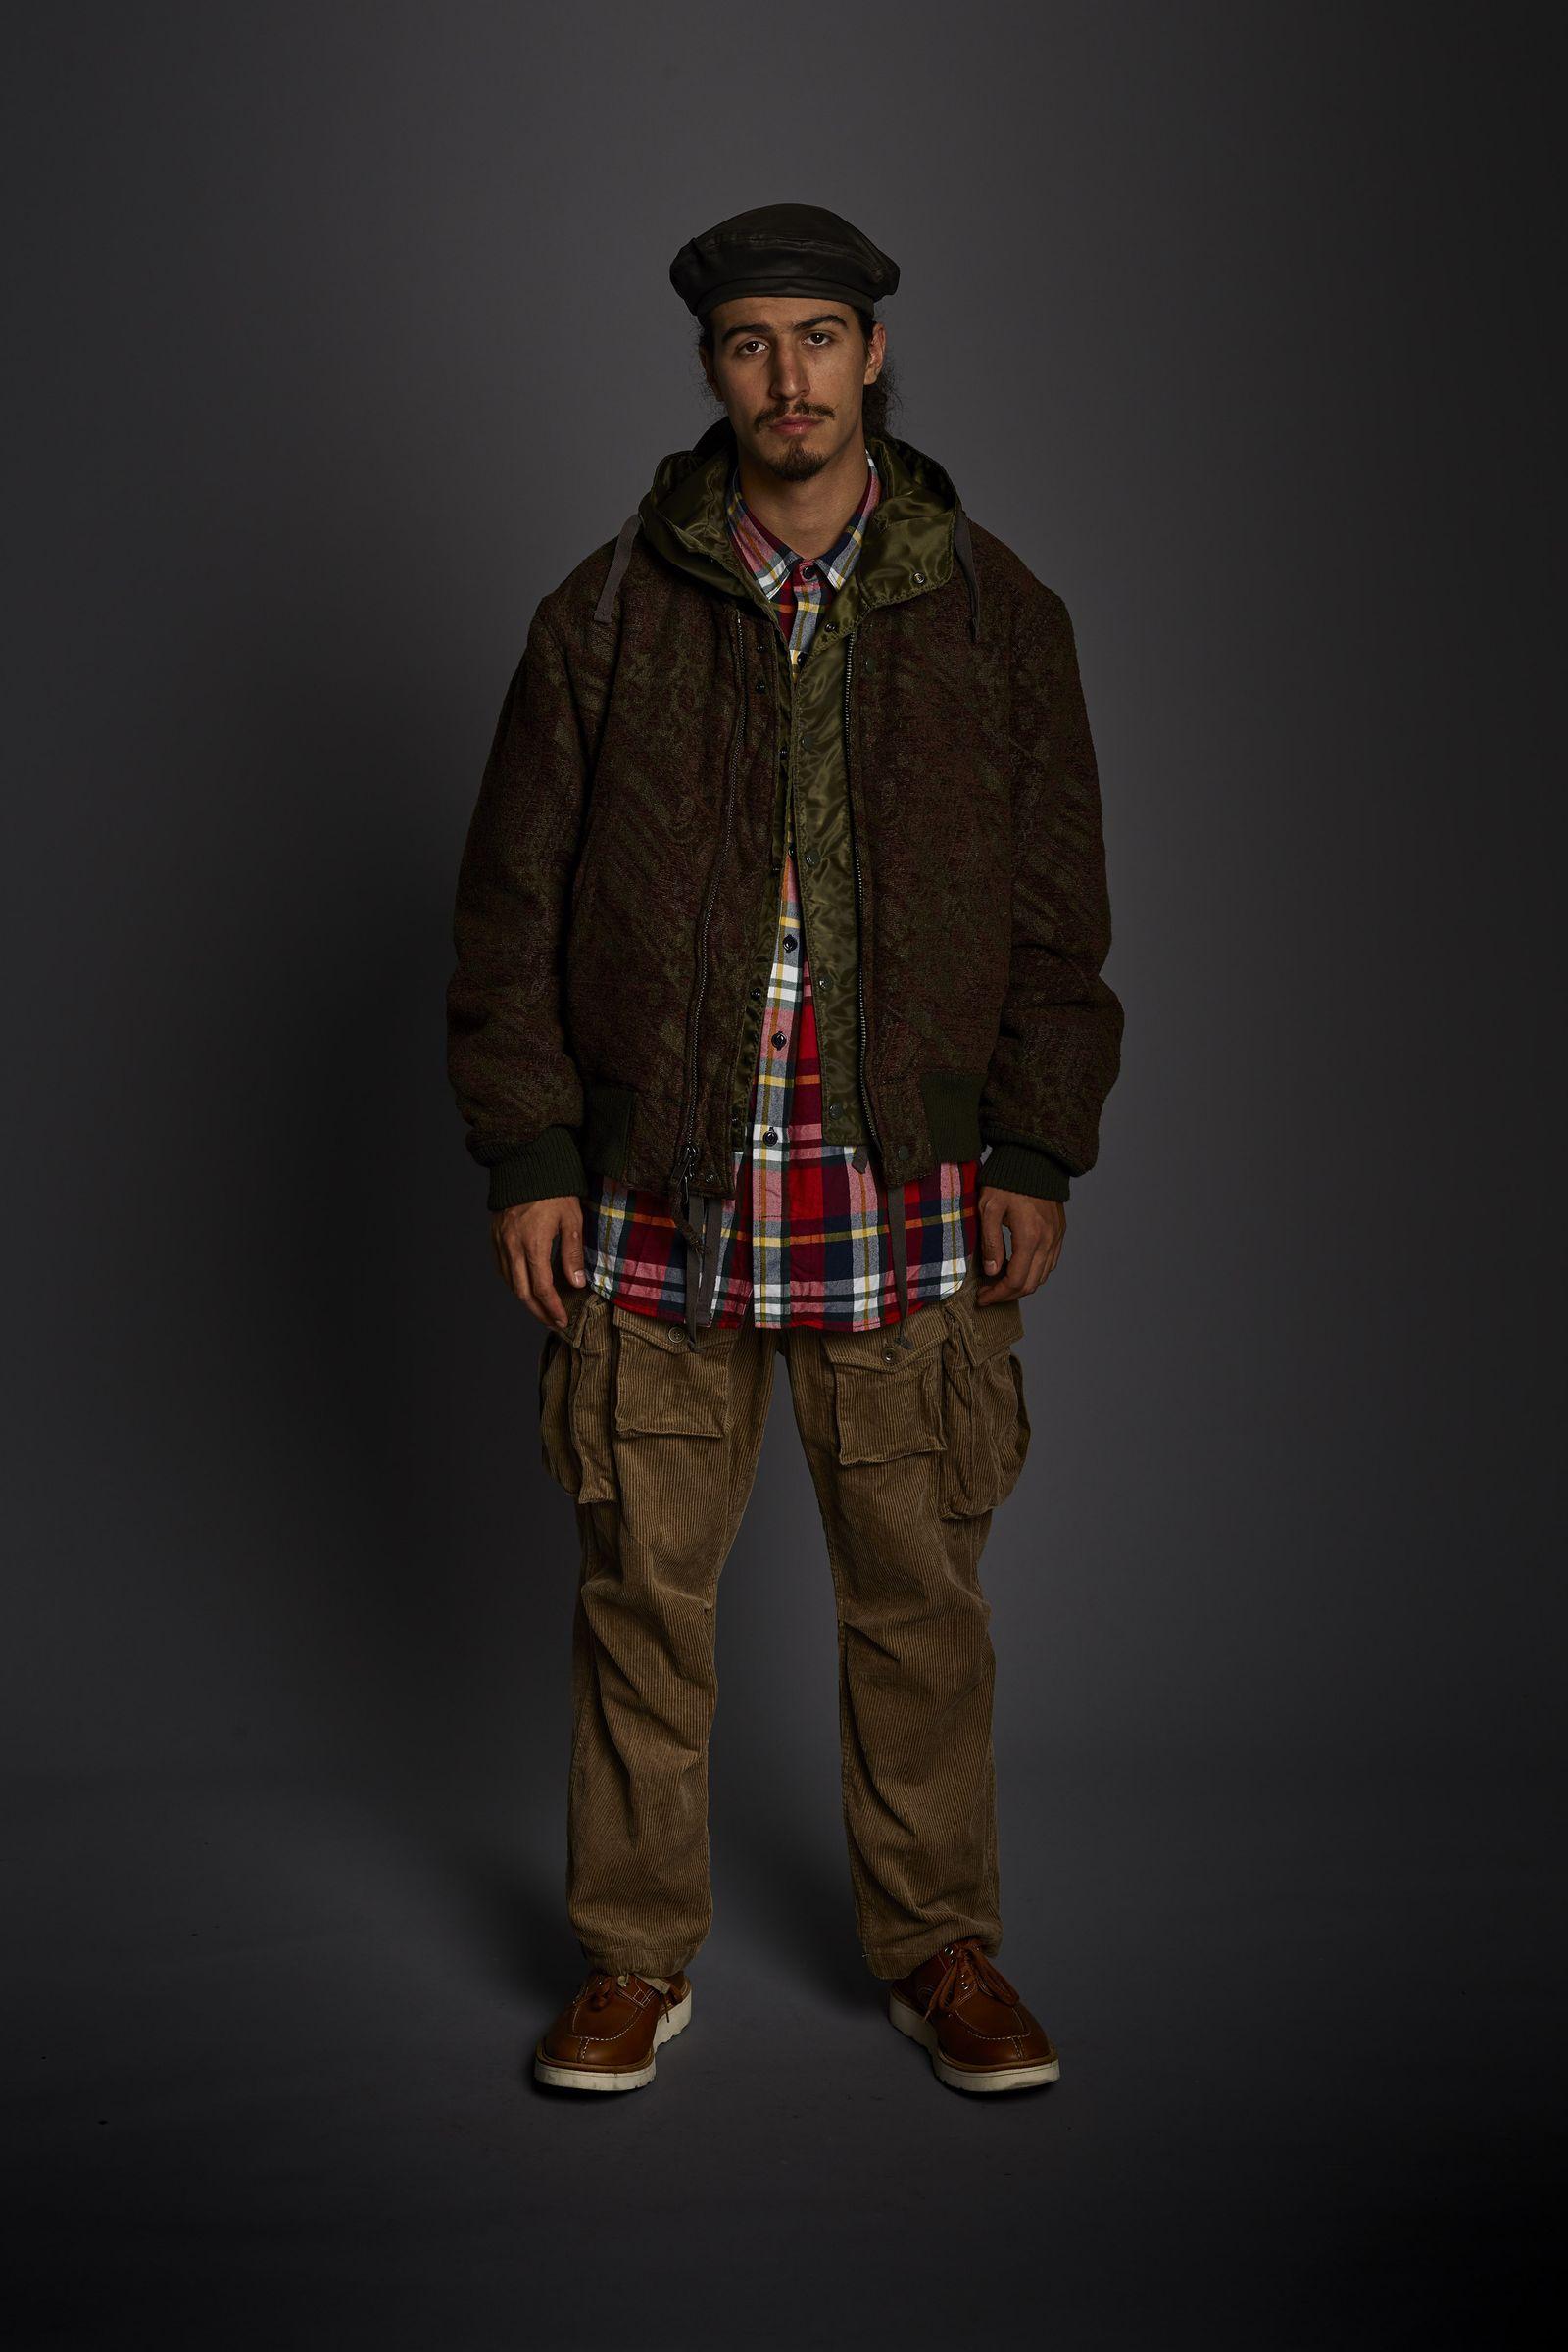 engineered-garments-fall-winter-2020-04